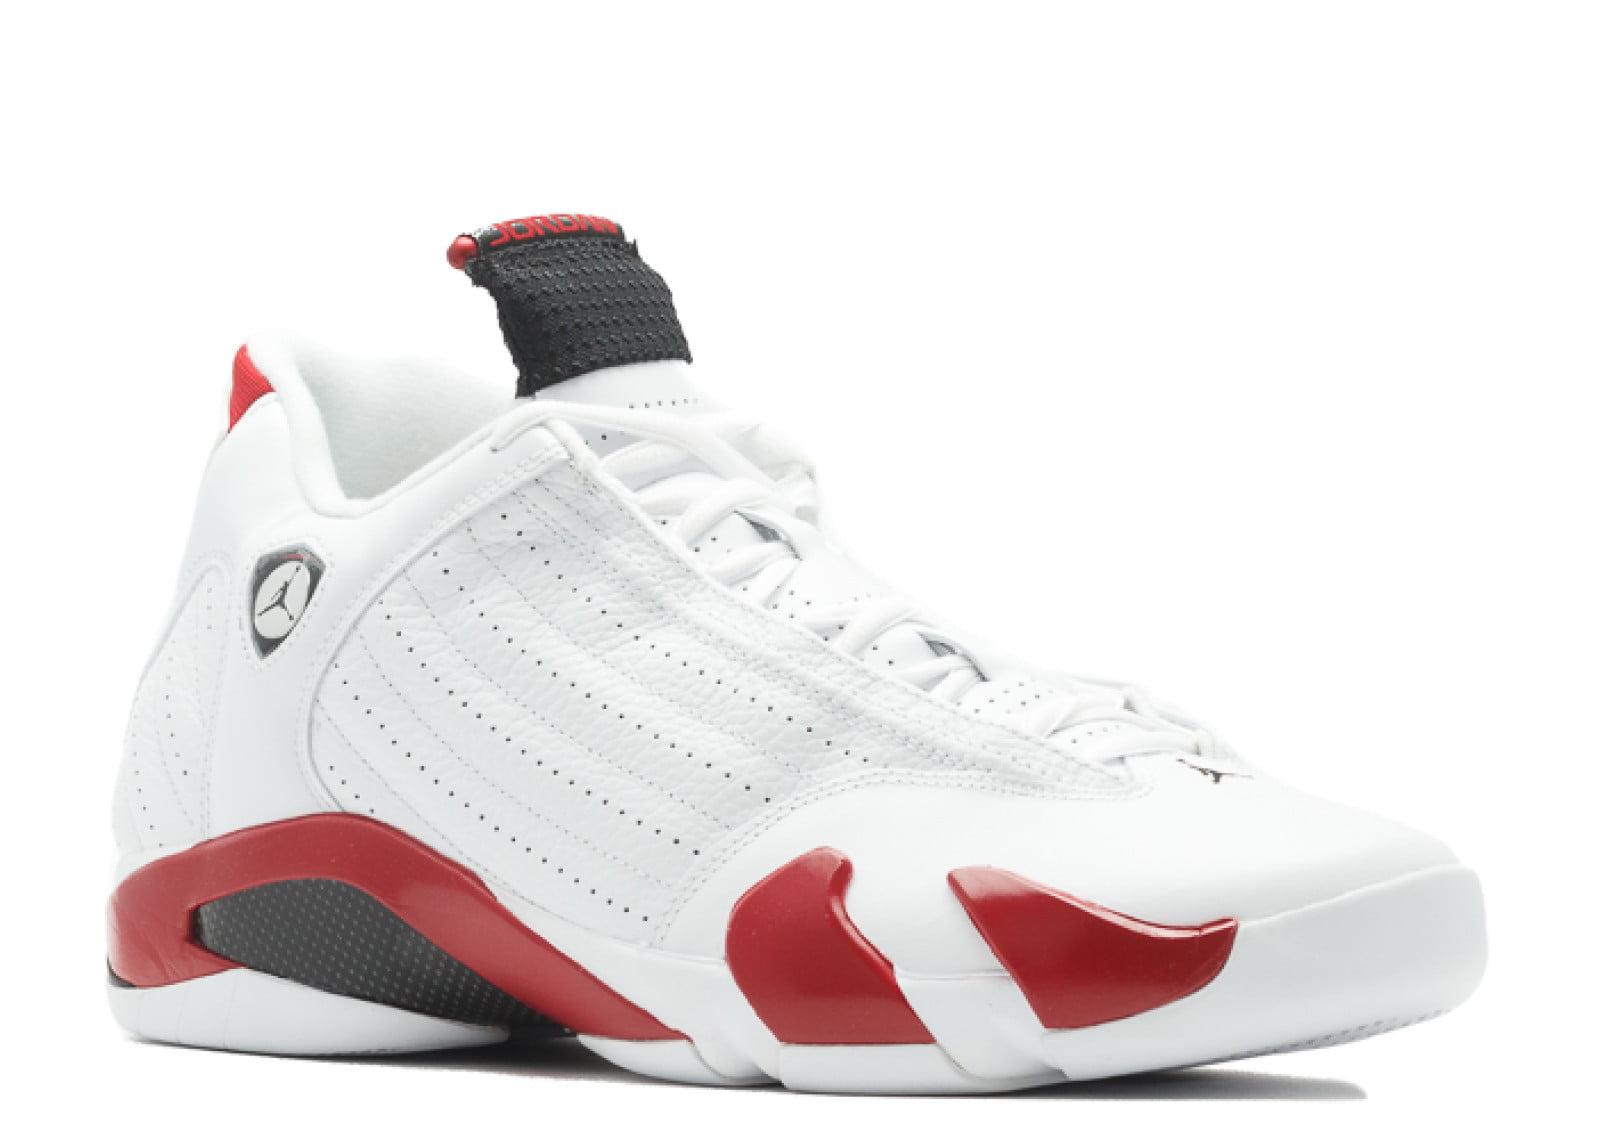 beb5ecf99bd Air Jordan - Men - Air Jordan 14 Retro 'Candy Cane' - 487471-101 - Size 11